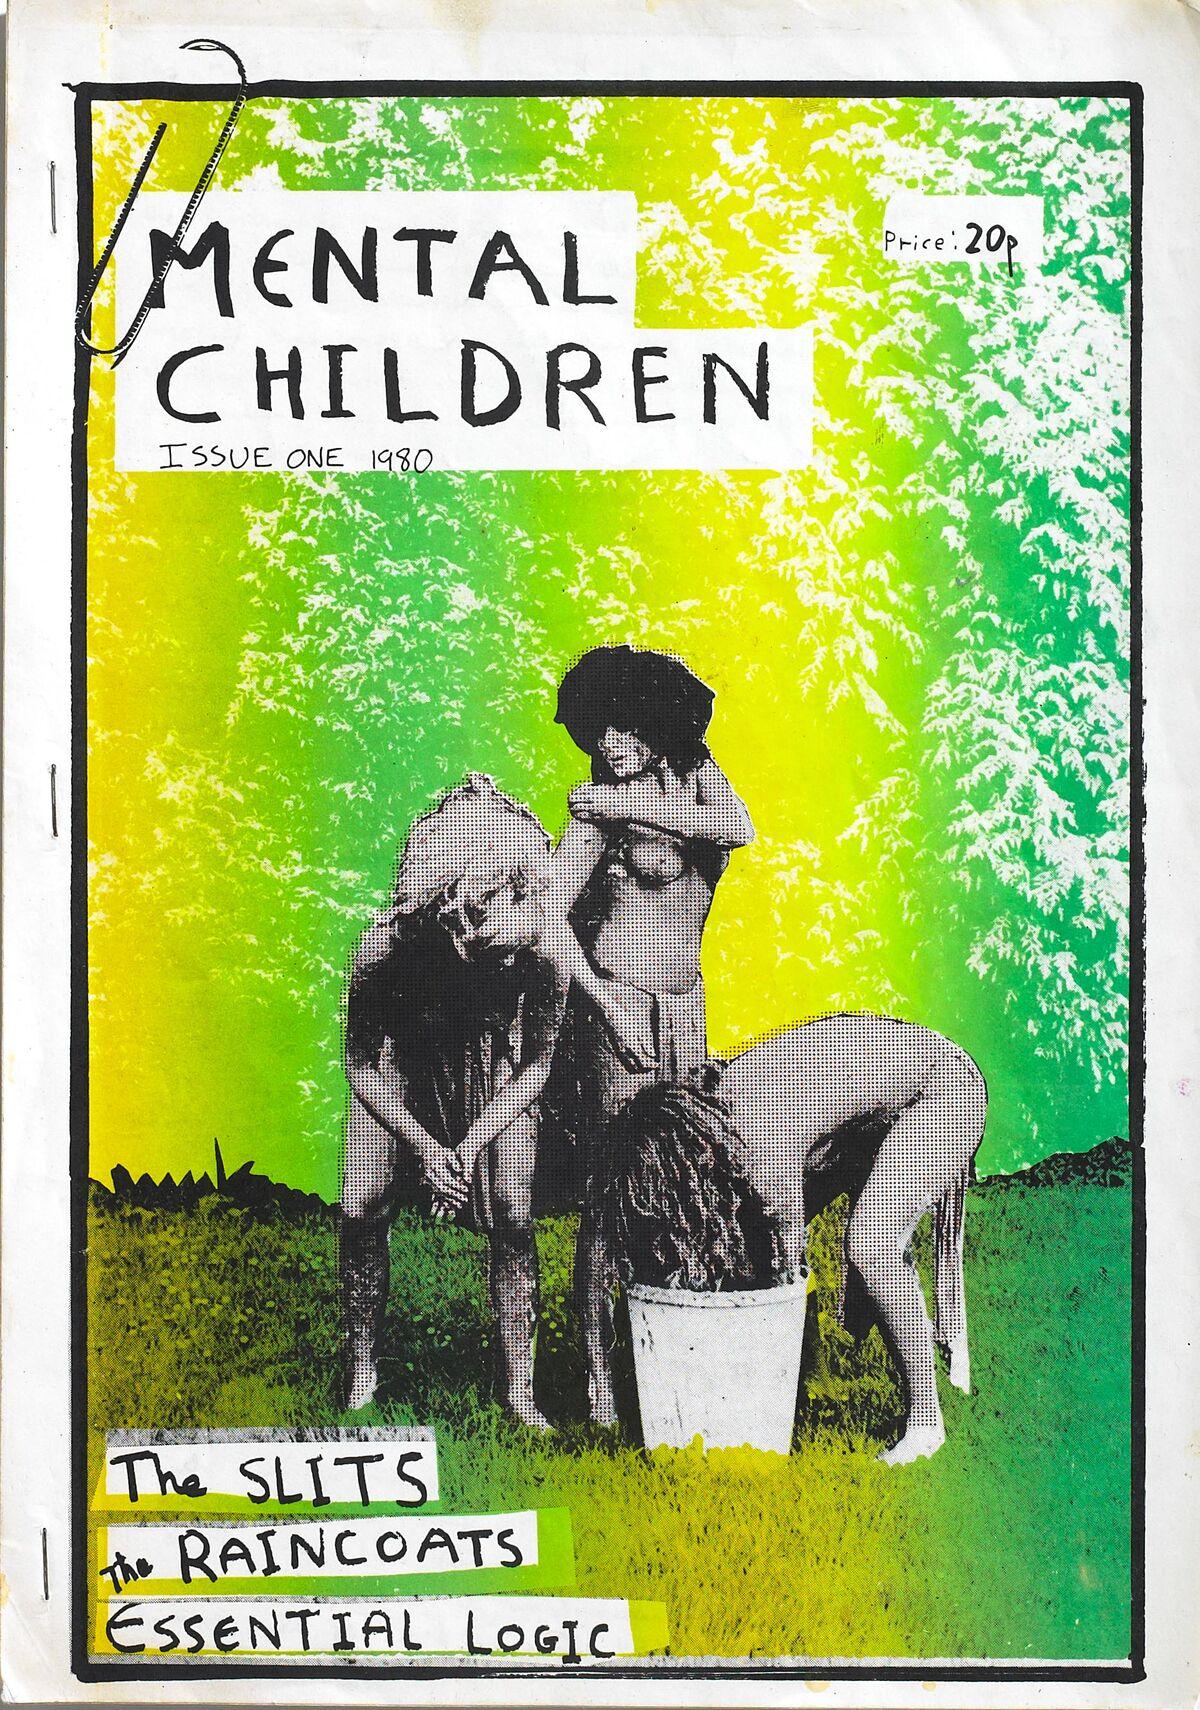 The Slits, The Raincoats, Essential Logic: Mental Children, Vol. 1, fanzine, 1980. Courtesy of Toby Mott/Mott Collection, London.